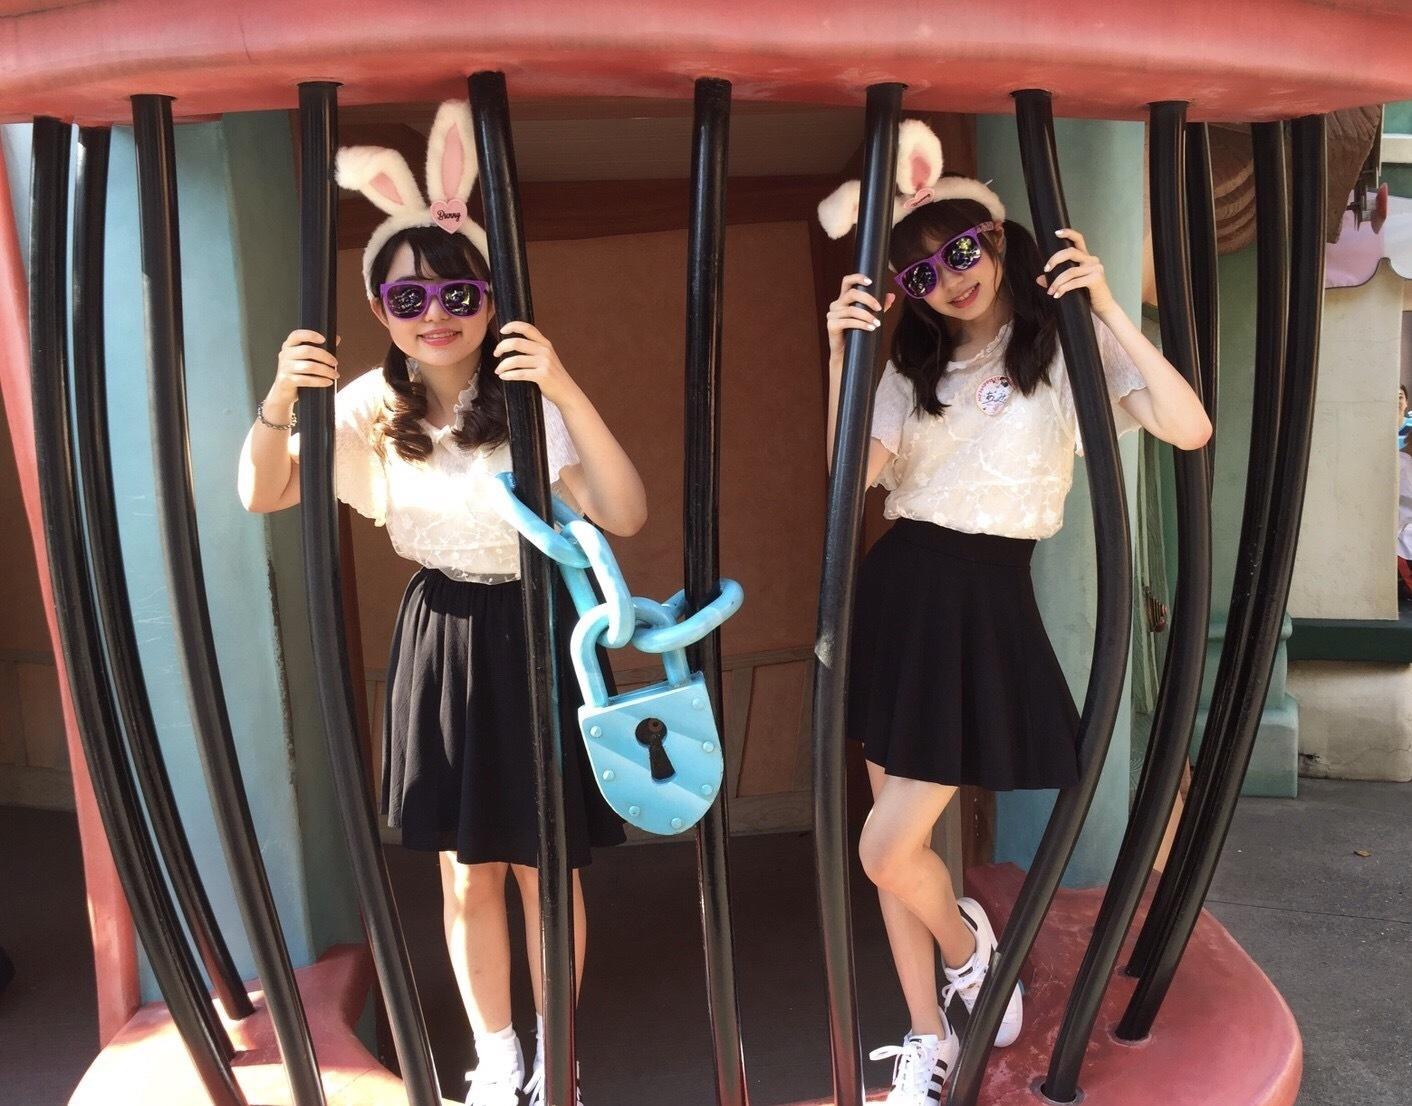 Vol.10♡【ディズニーイースター2017】東京ディズニーランドの写真スポットを紹介☆_1_8